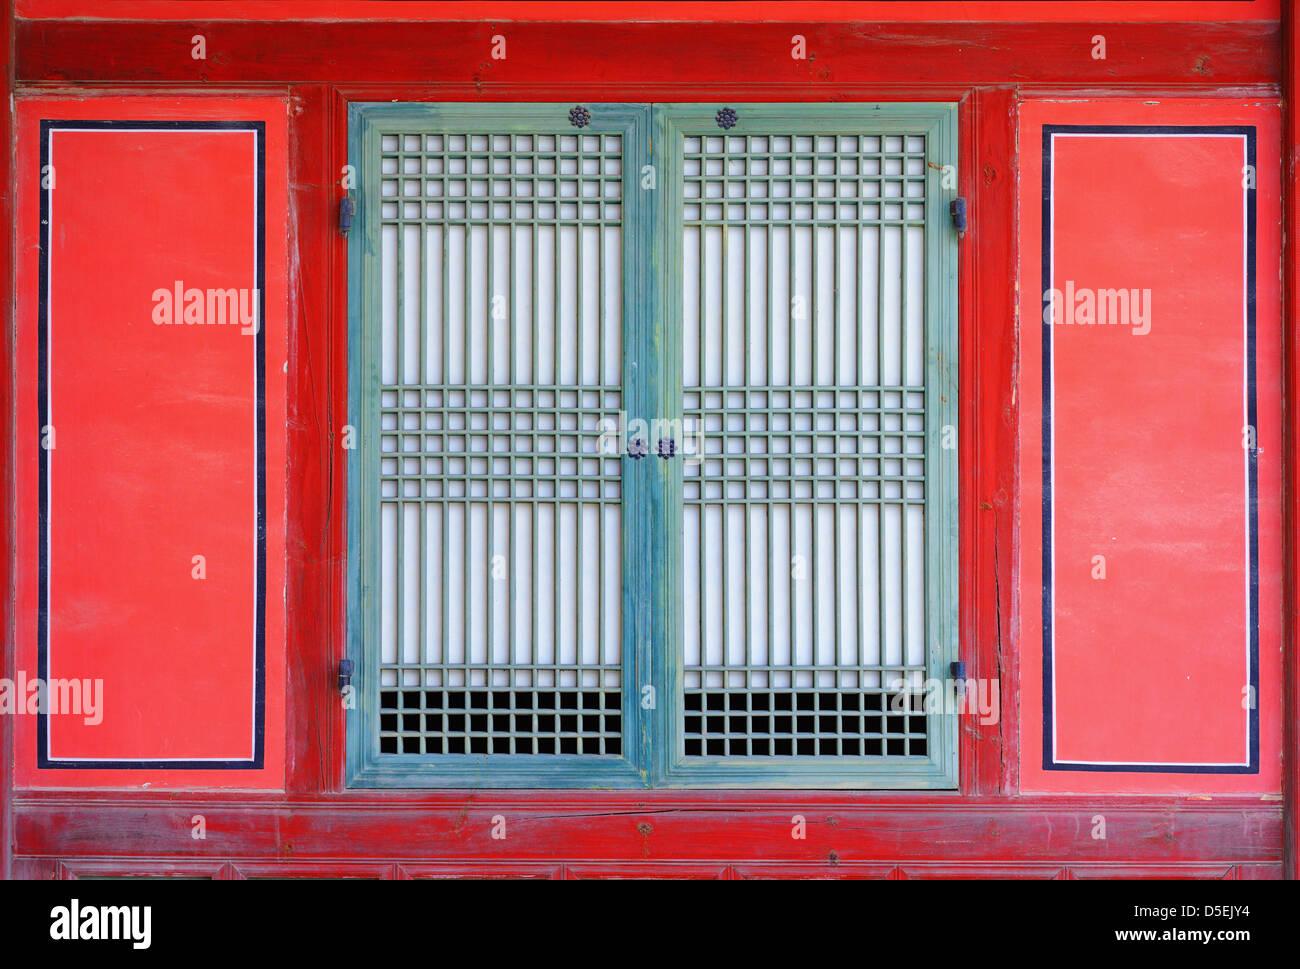 window on a gyeongbokgung palace in seoul, korea. - Stock Image